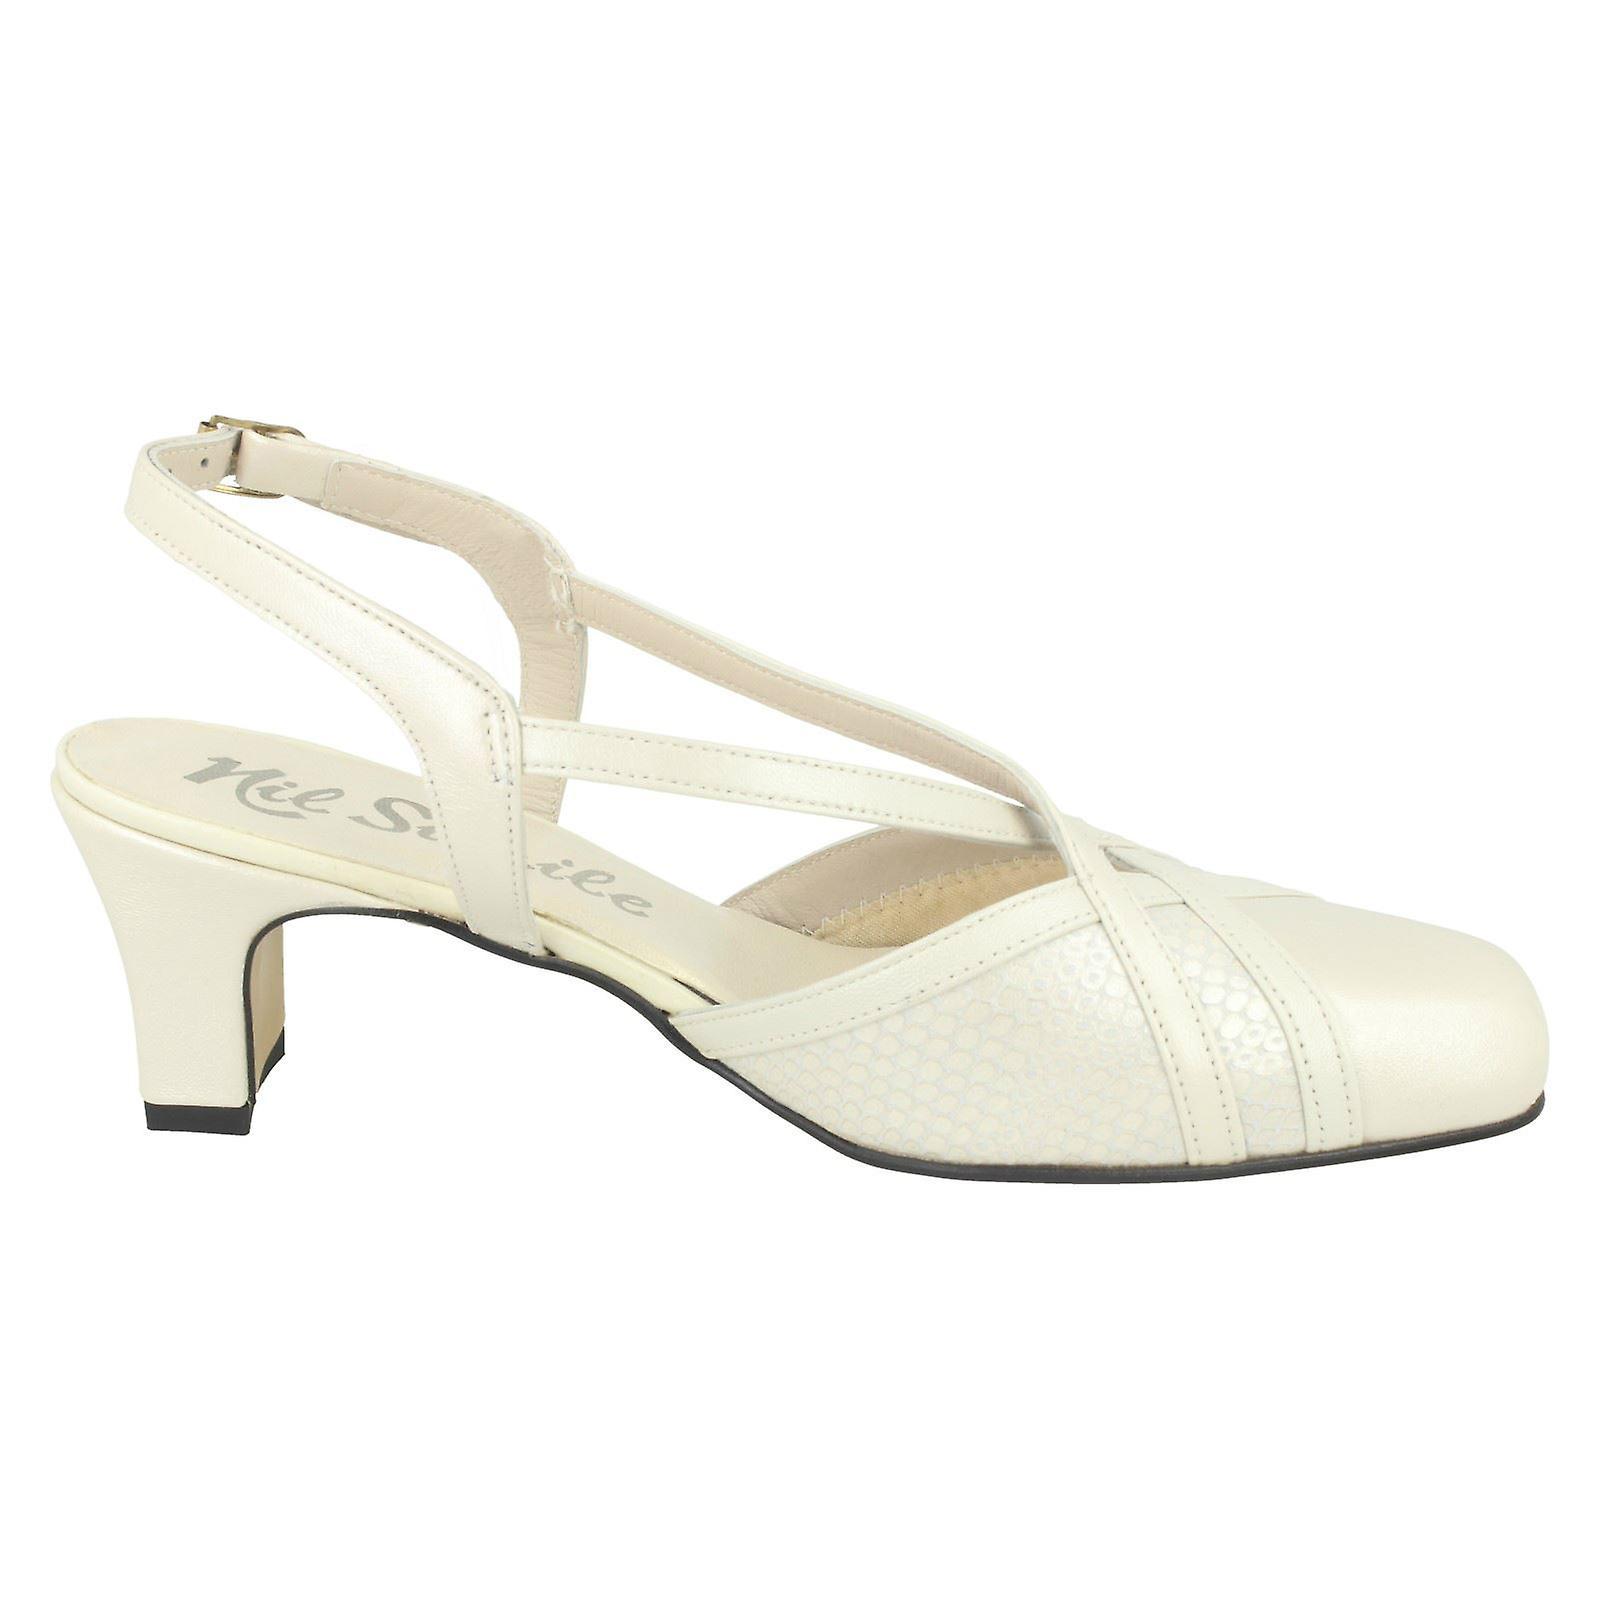 Ladies Nil Simile Narrow Fitting Formal Formal Formal Shoes Bandana 5ea9ff